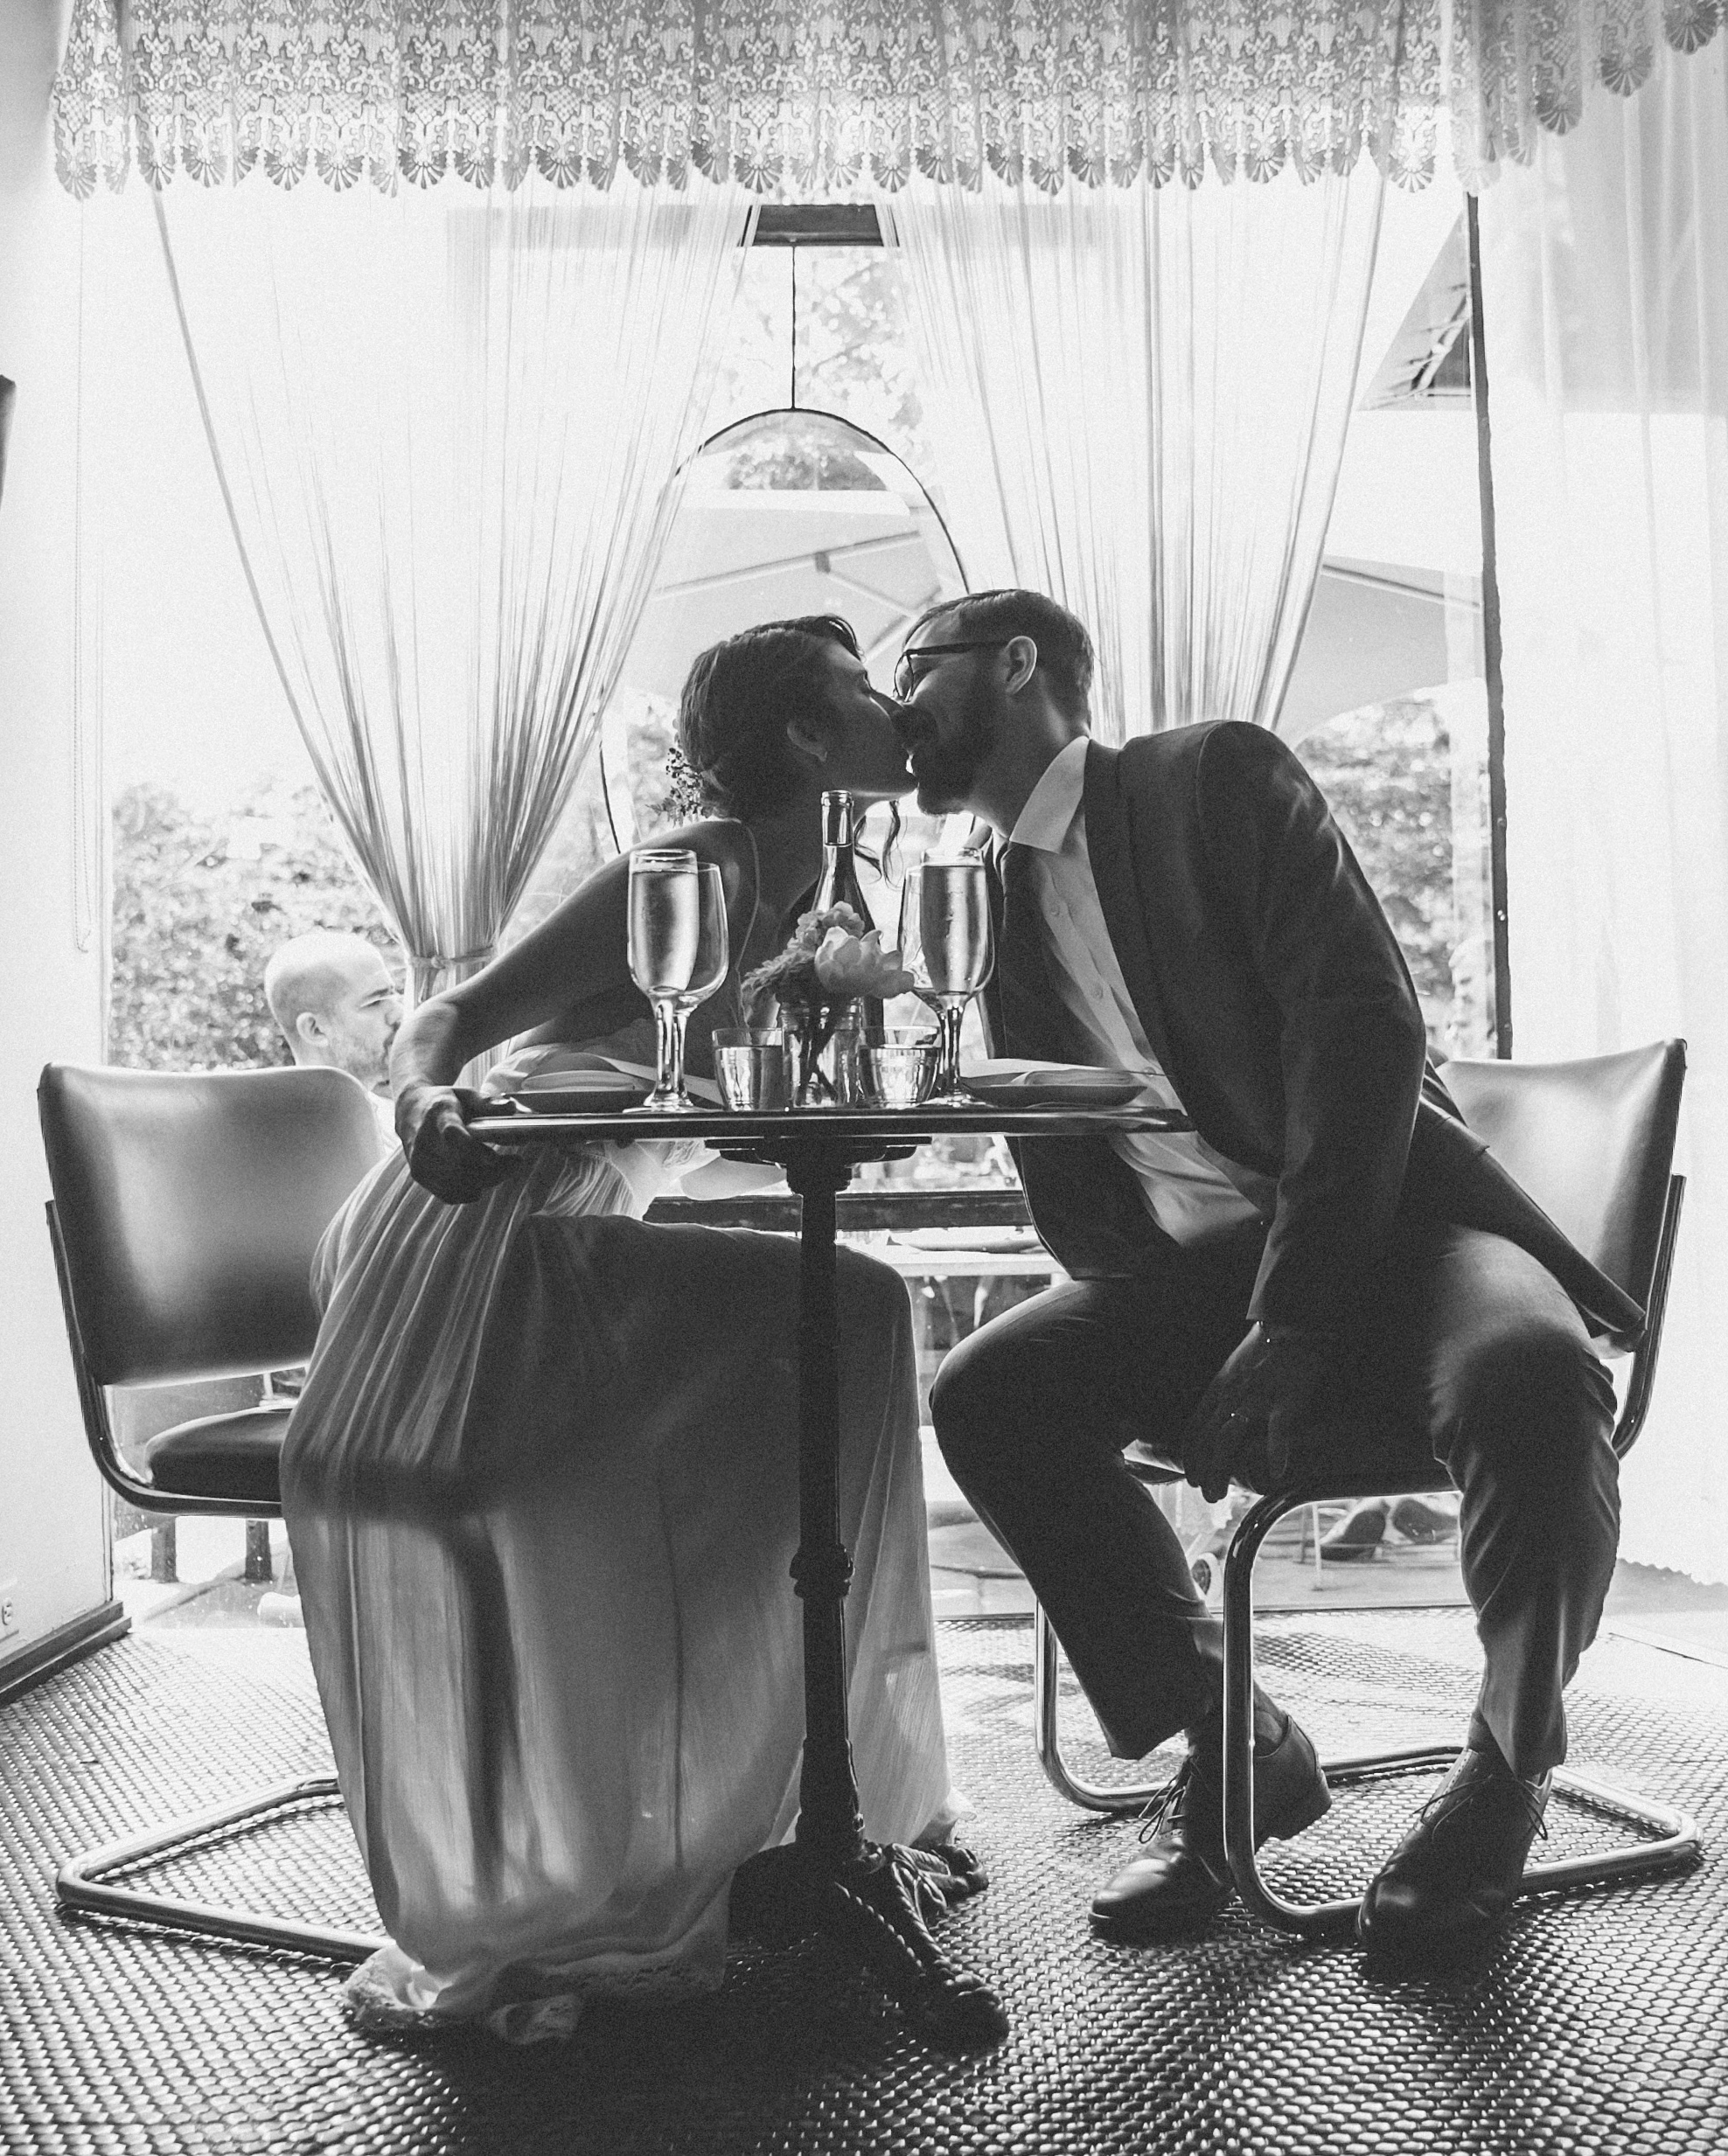 sadie-brandon-wedding-kiss-77-ss112173-0915.jpg